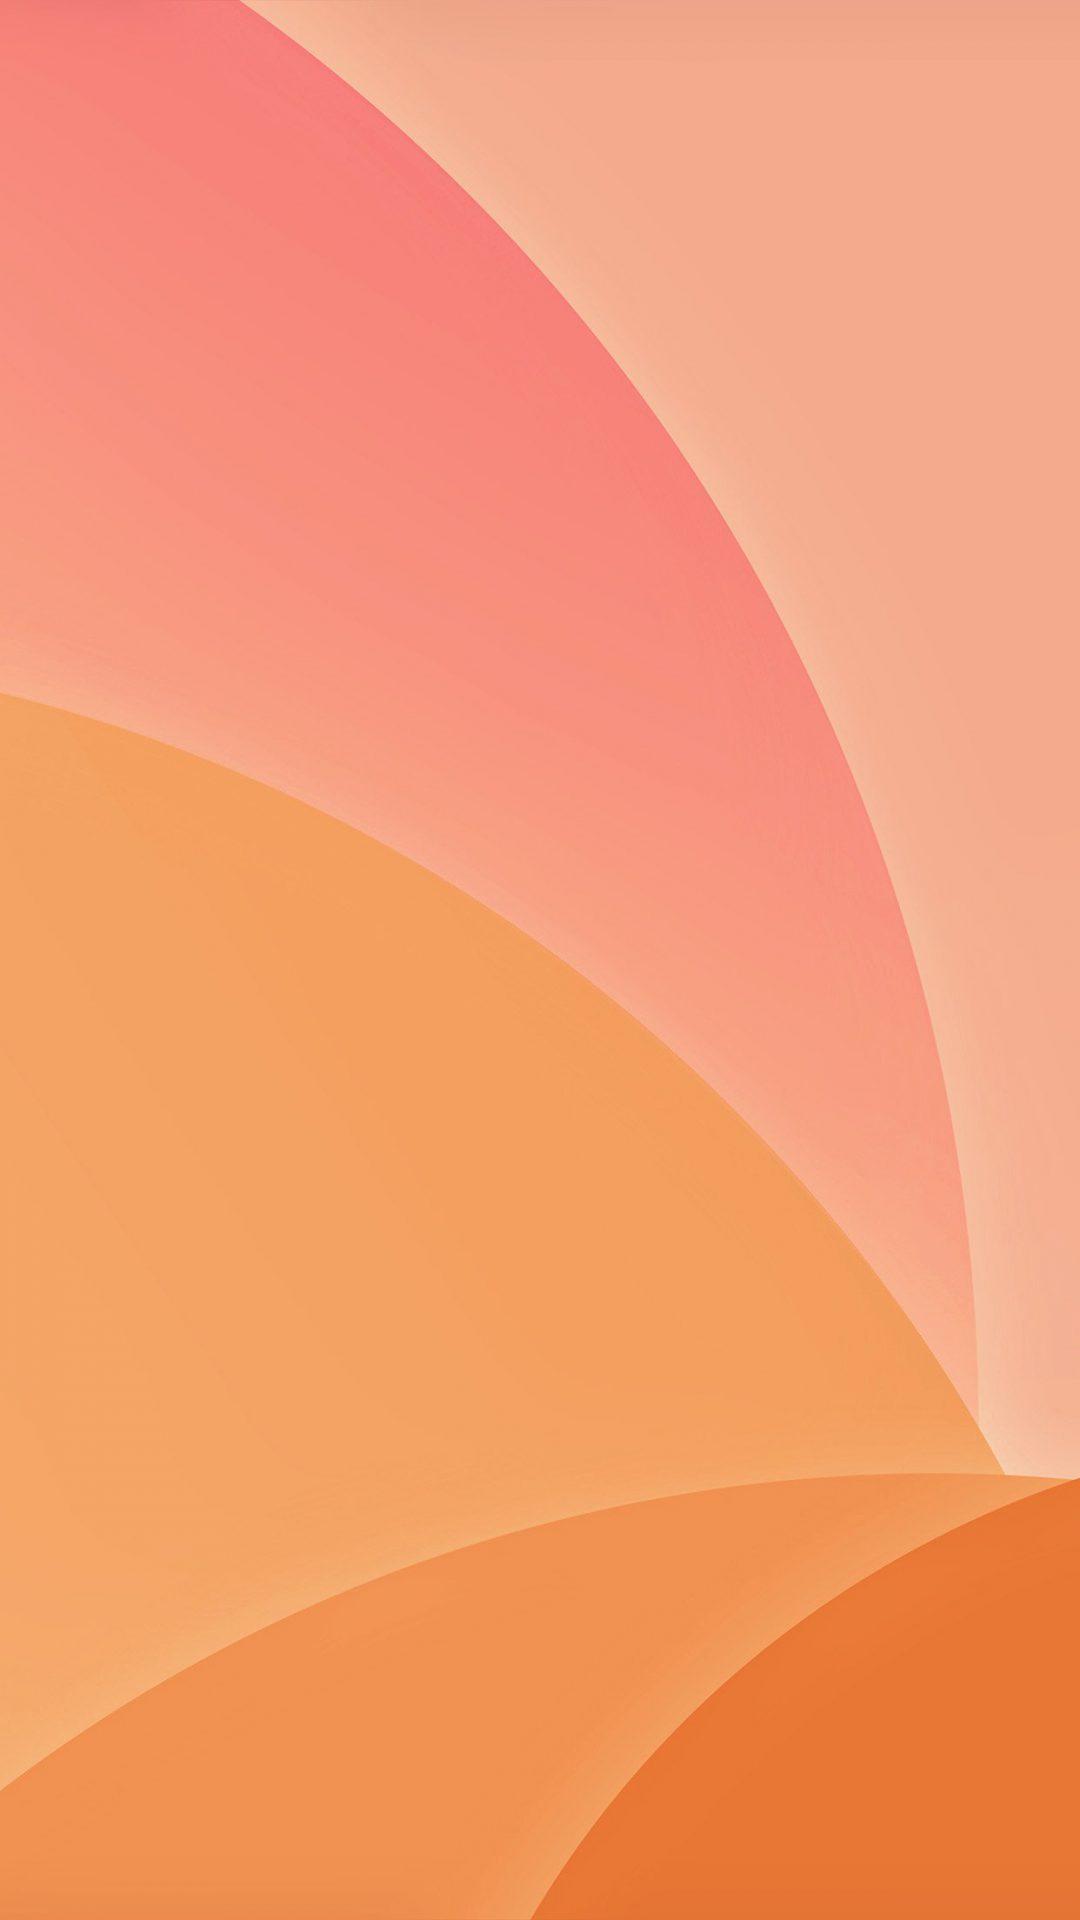 Orange Yellow Circle Art Abstract Shadow Pattern